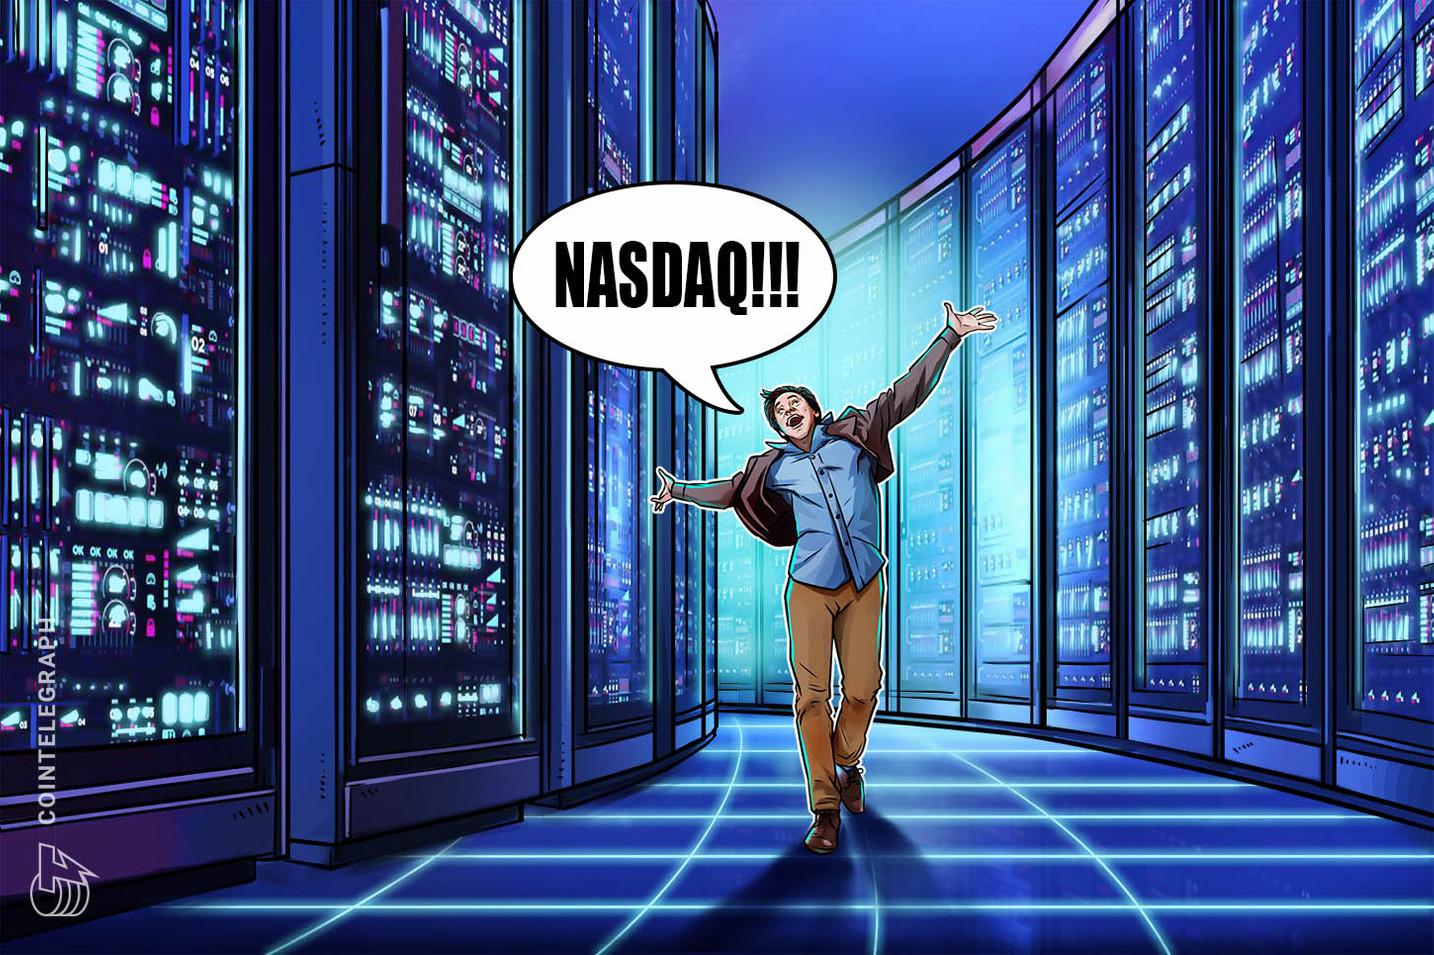 US Bitcoin mining giant Core Scientific set for Nasdaq listing via $4.3B SPAC deal